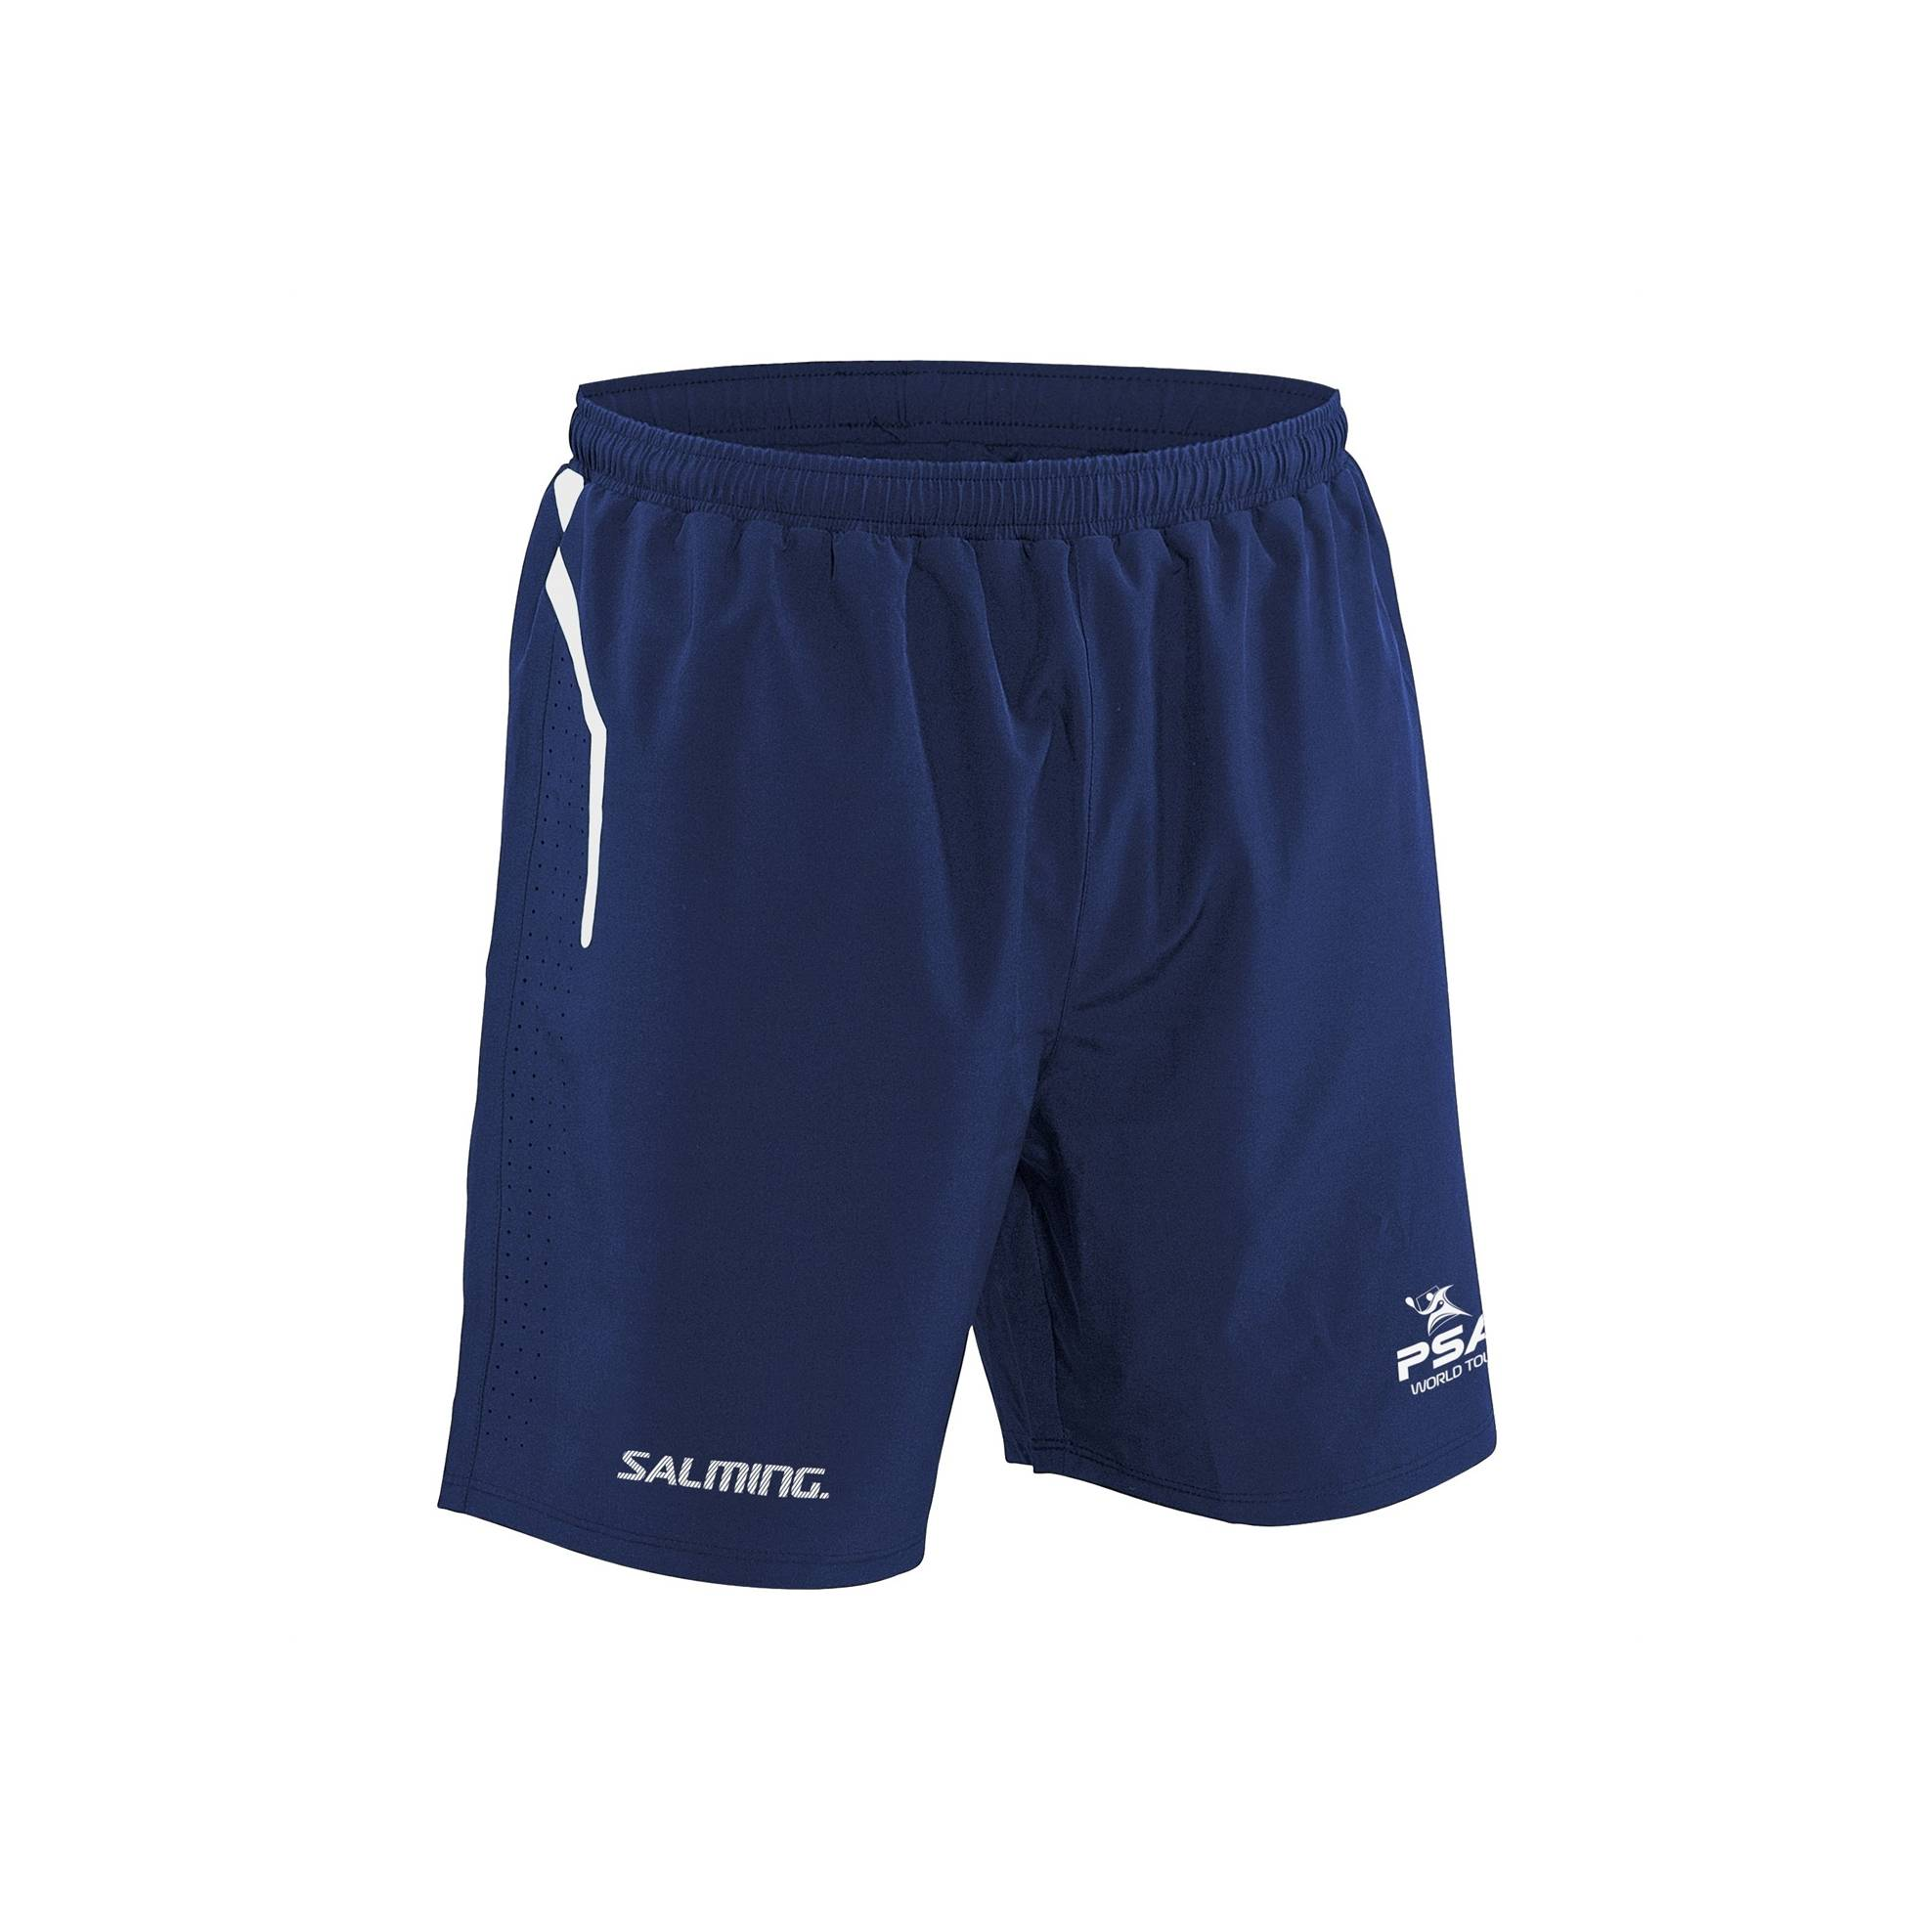 Salming PSA ProTraining Shorts Navy Blue M